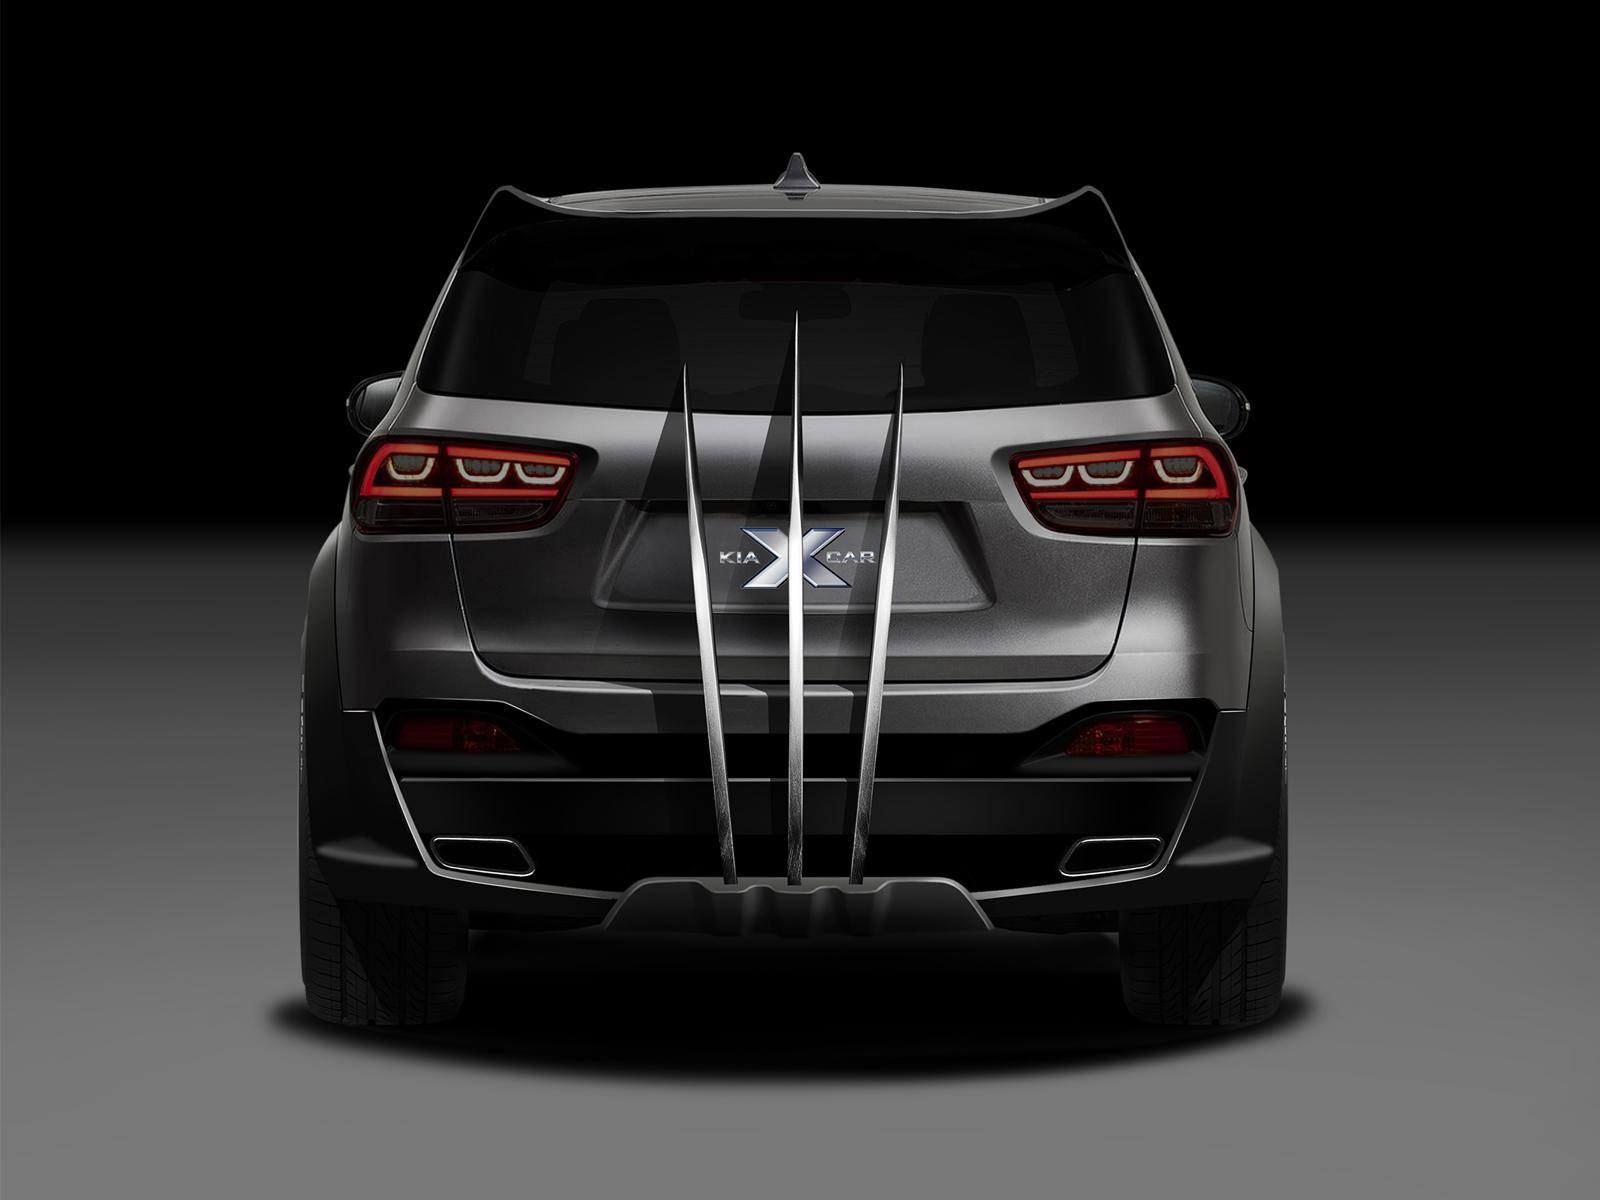 Black Kia Sorento >> Wolverine's Kia Sorento is an X-Men Promo Vehicle - autoevolution